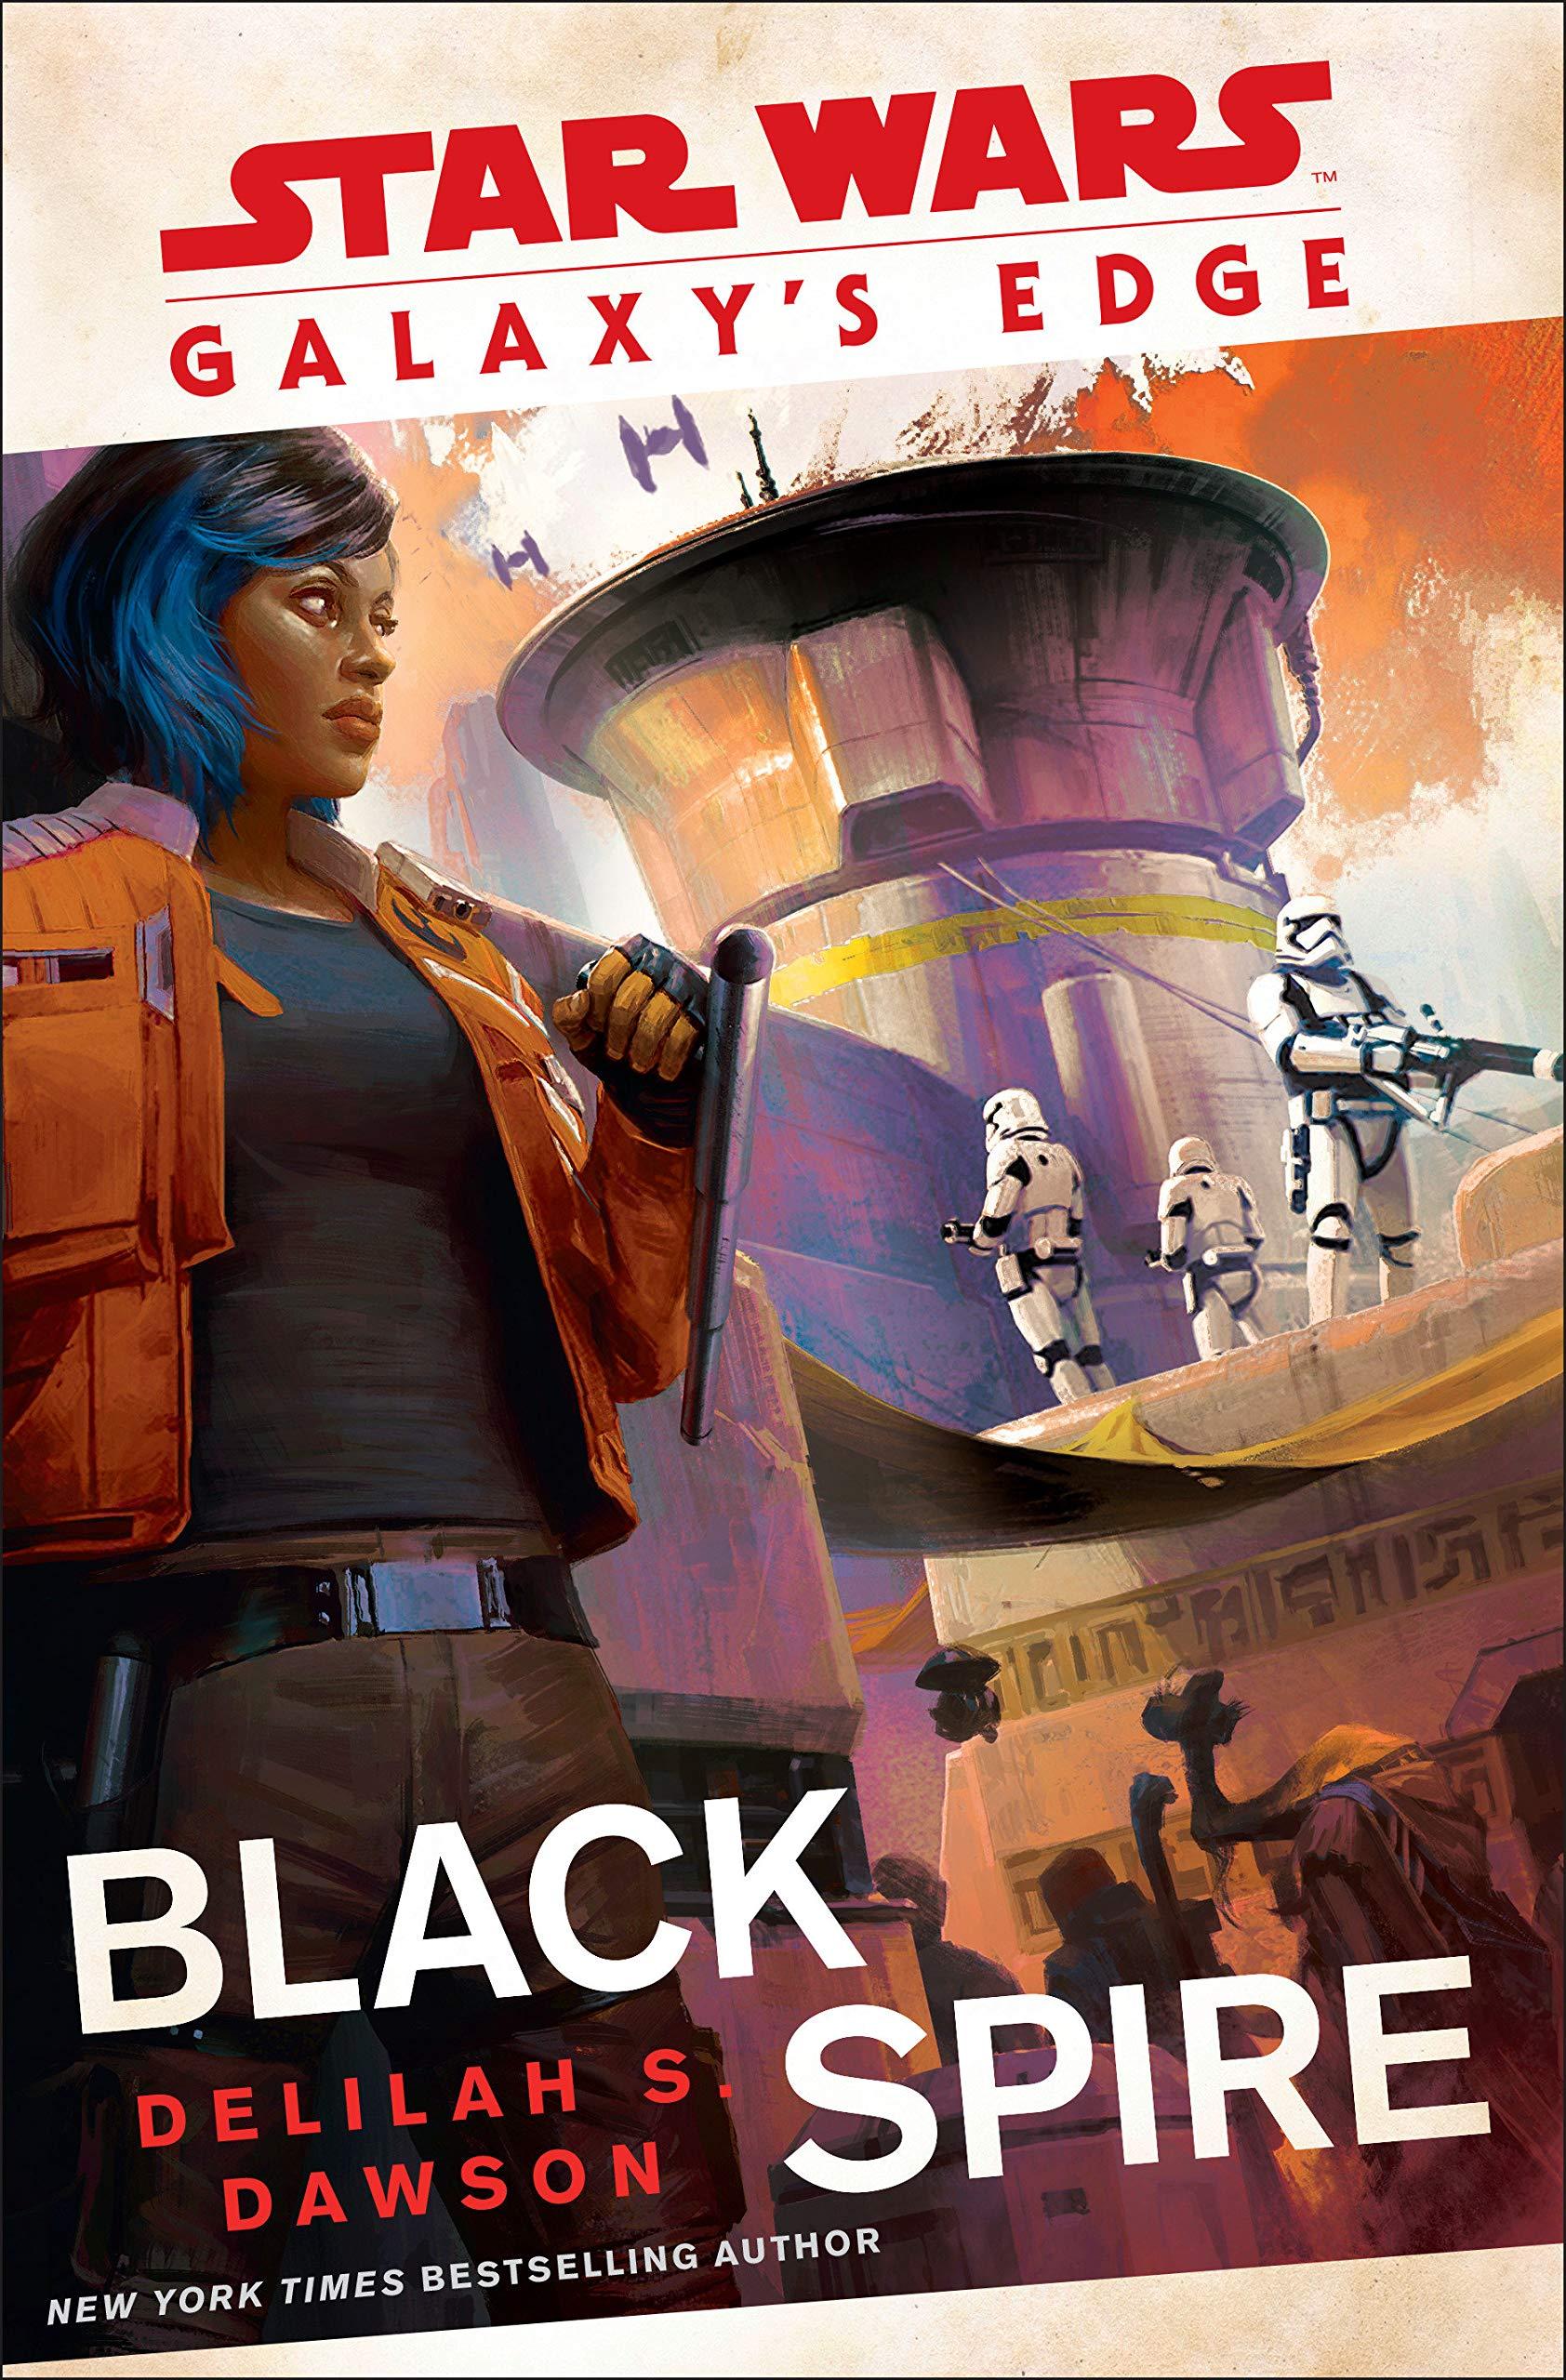 Galaxy S Edge Black Spire Star Wars 9780593128381 Dawson Delilah S Books